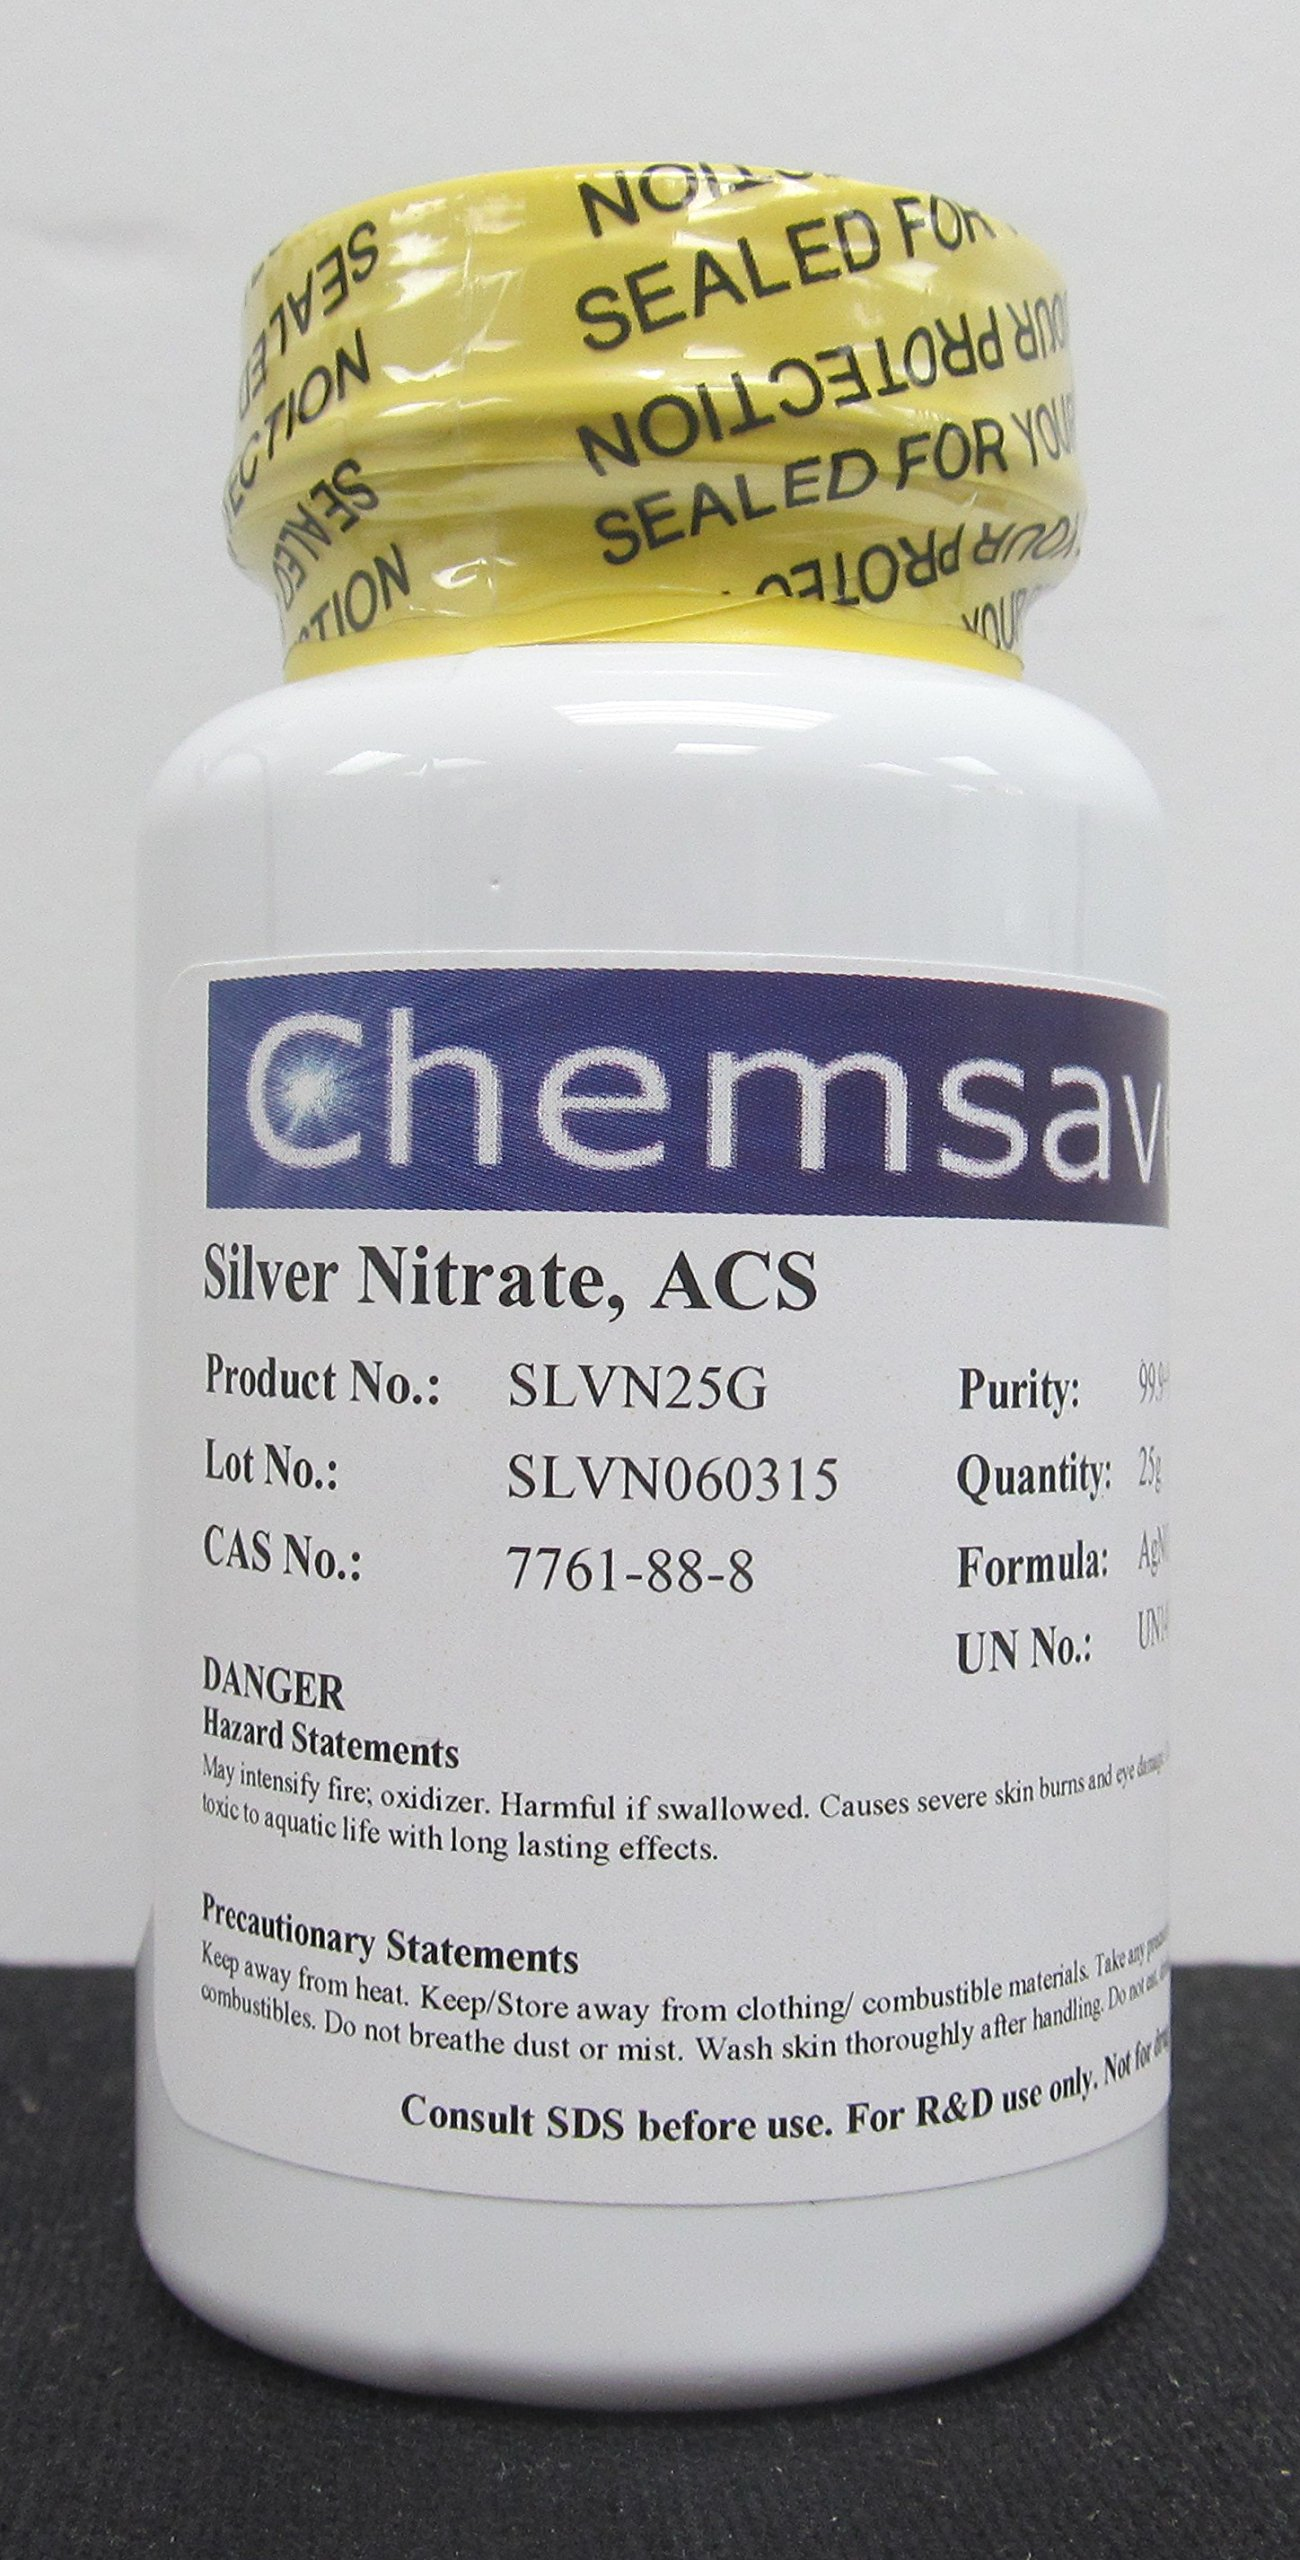 Silver Nitrate, ACS, 99.9+%, 25g